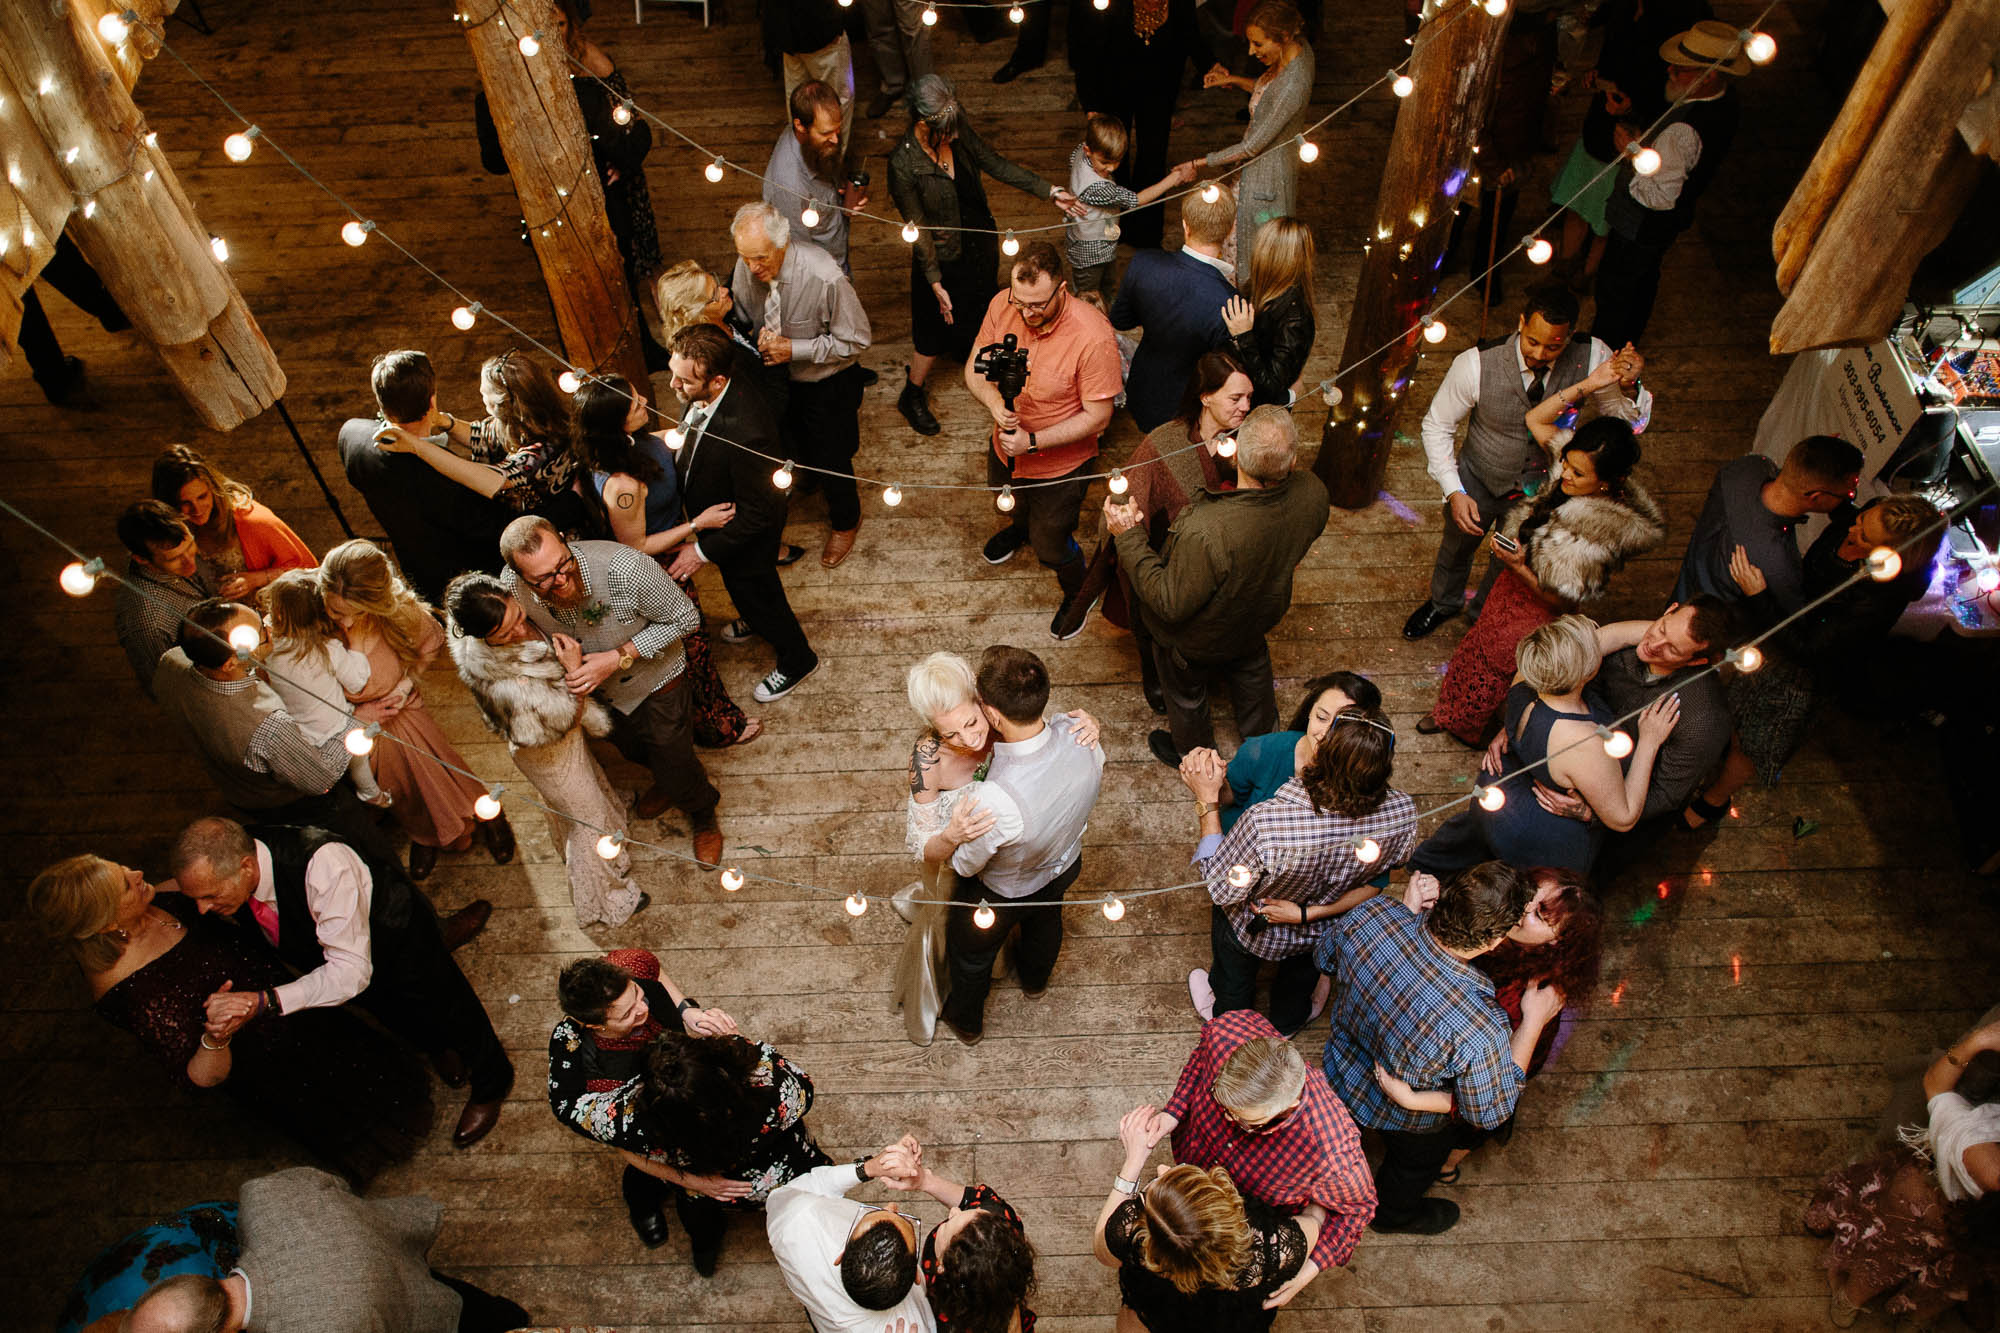 bucci-barn-wedding-elopement-evergreen-boulder-denver-colorado-adventerous-romantic-timeless-109.jpg